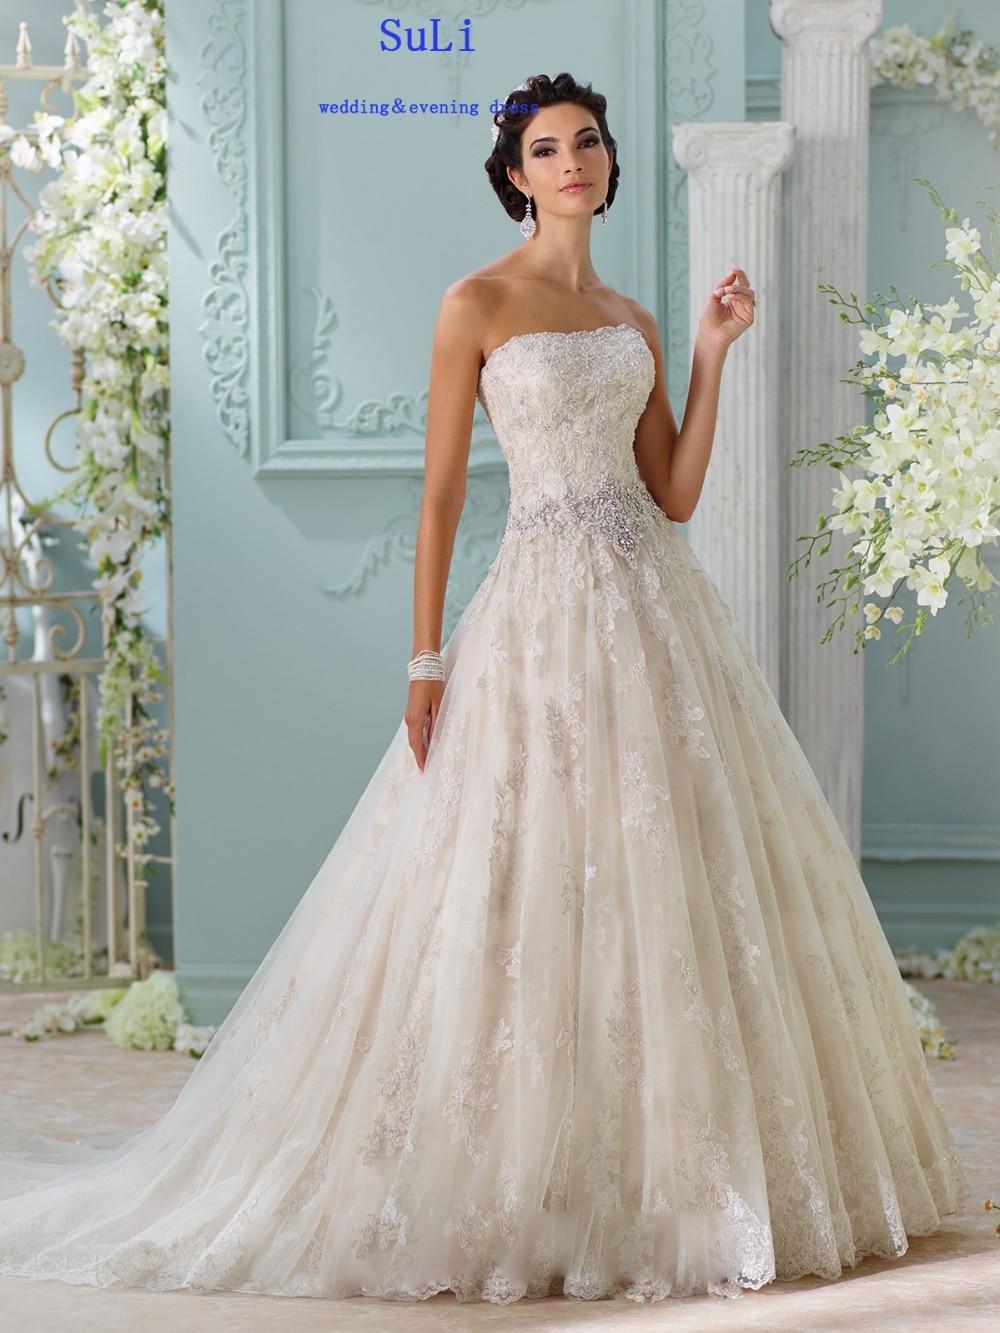 Fancy Wedding Dress Sa Illustration - Wedding Dress Ideas ...